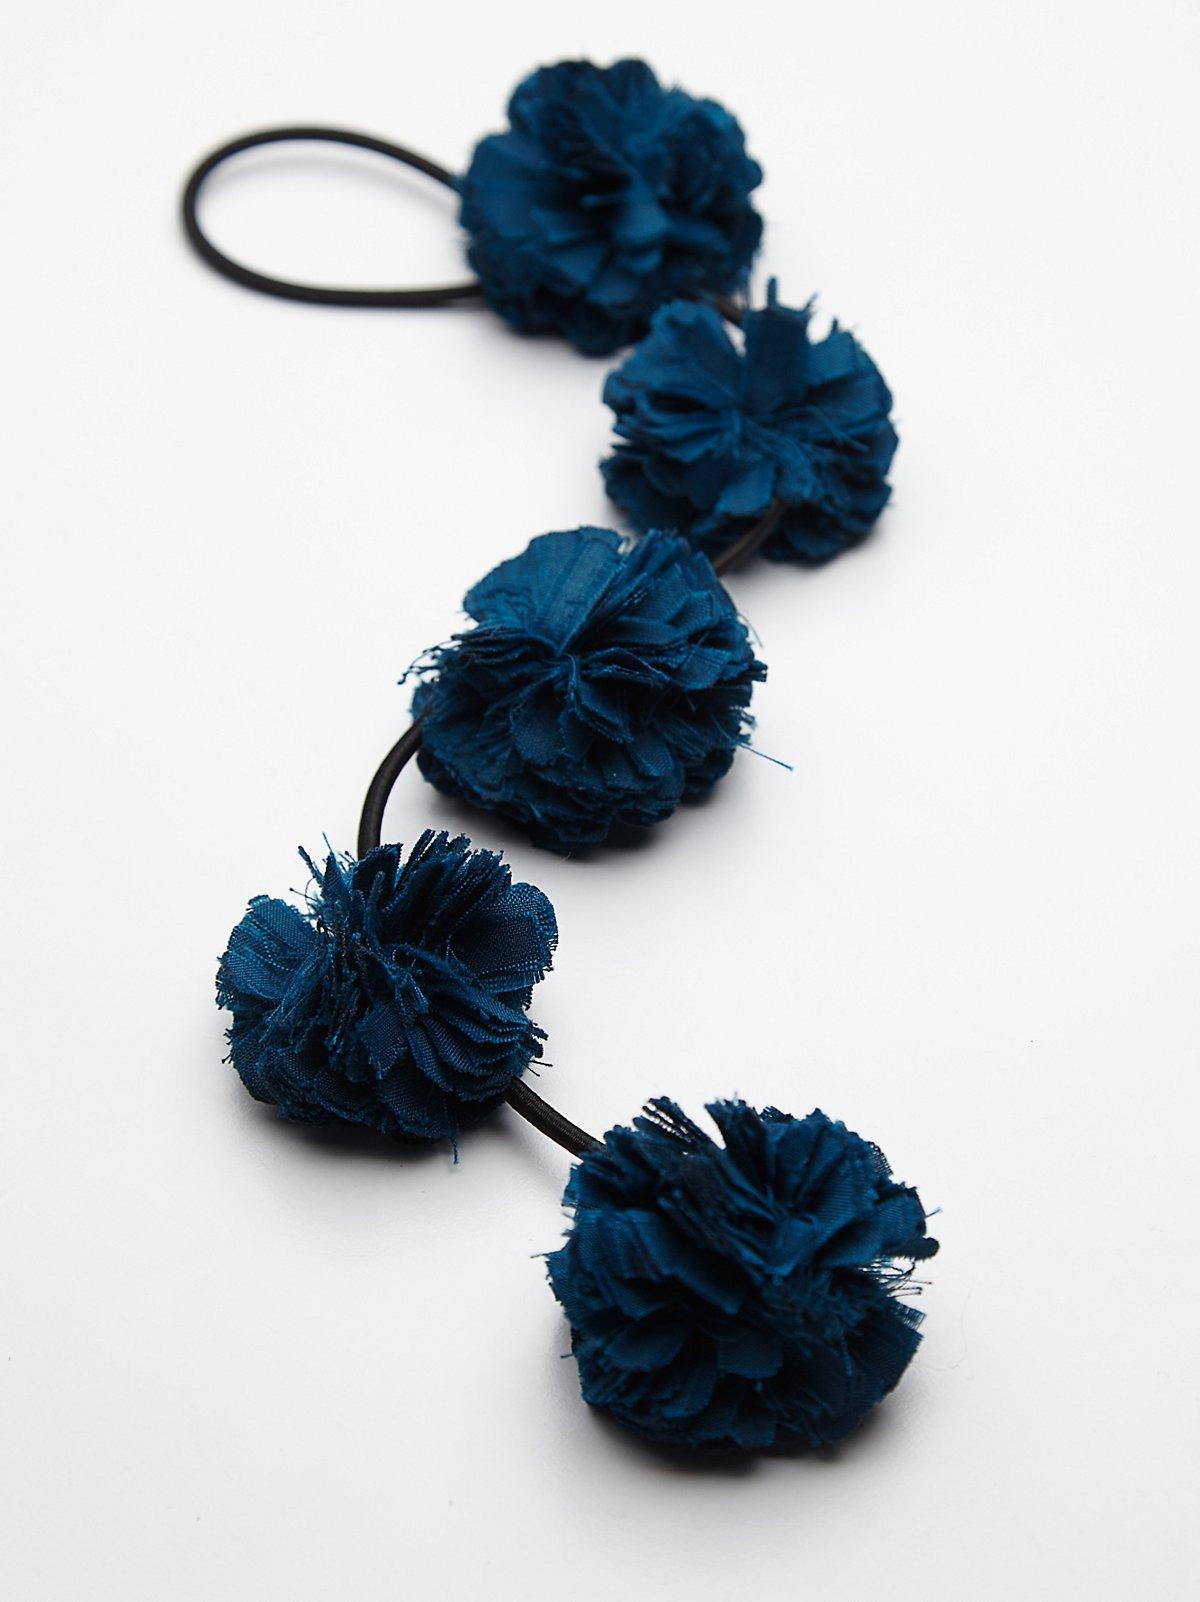 Pom Pom花卉编织发绳